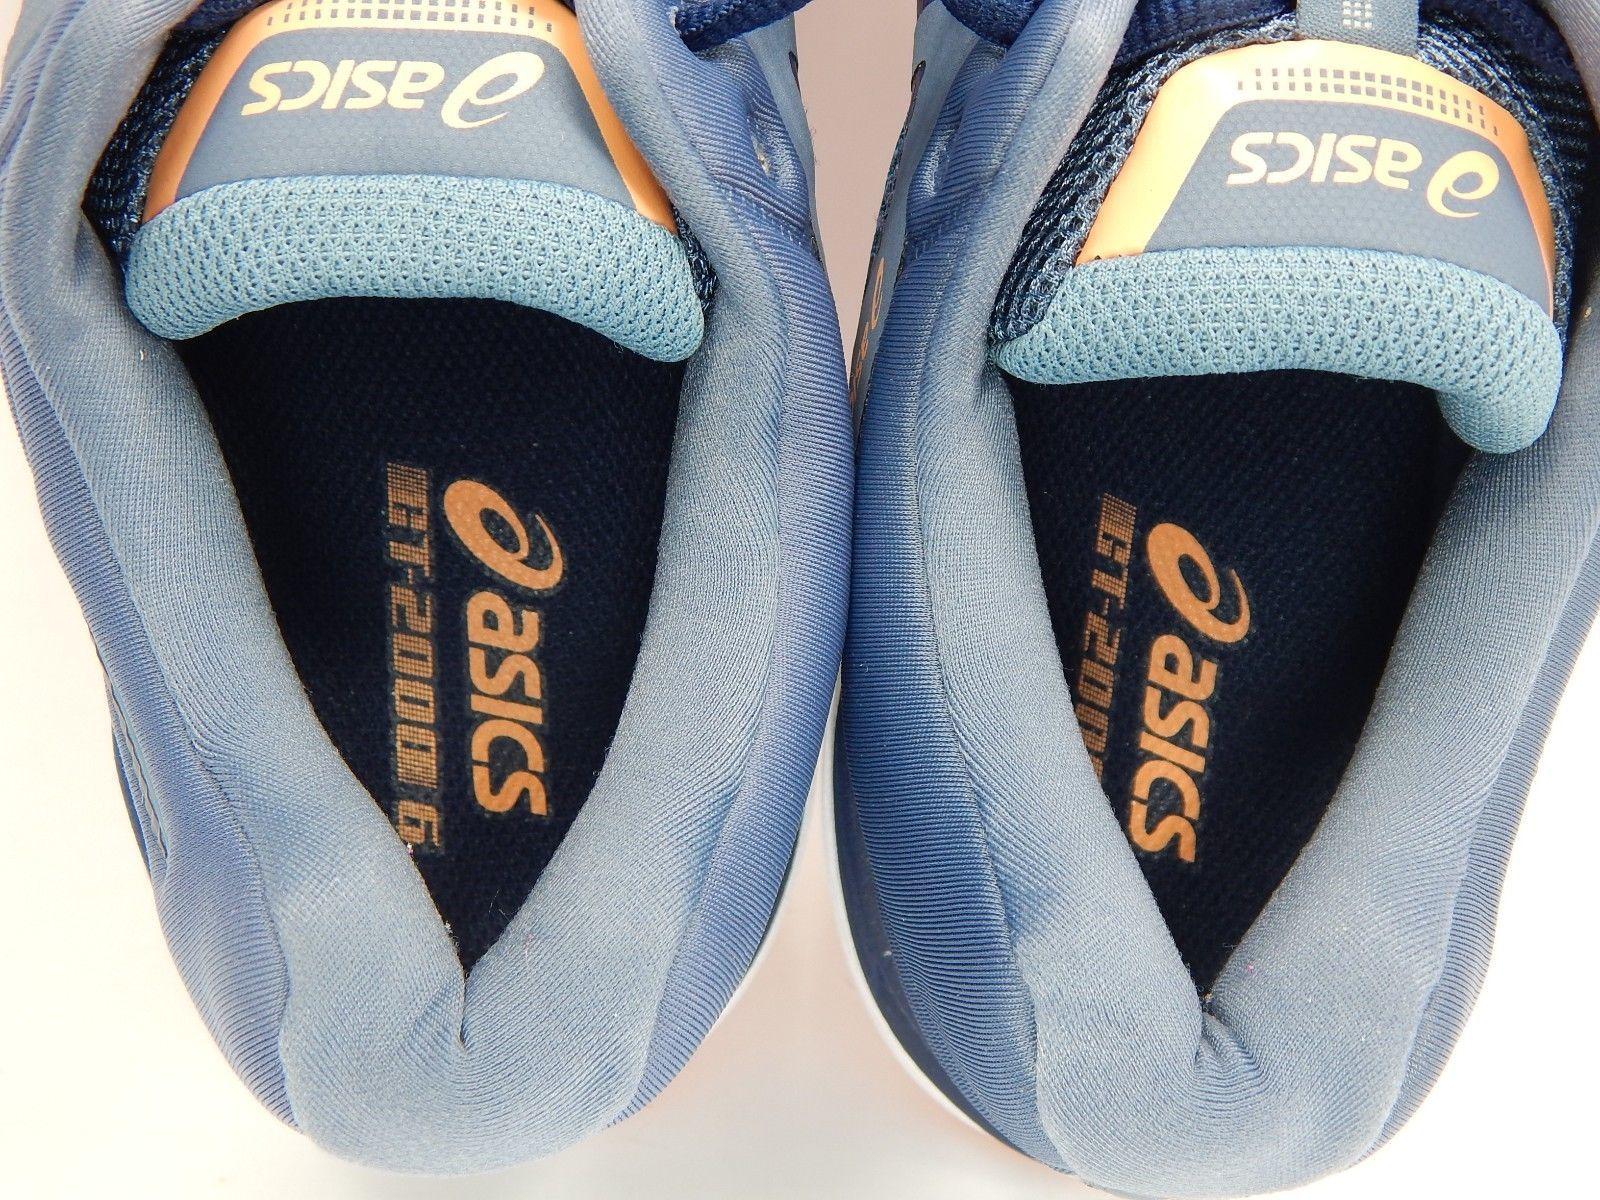 Asics GT 2000 v 6 Size 10 M (B) EU 42 Women's Running Shoes Pink Blue T855N